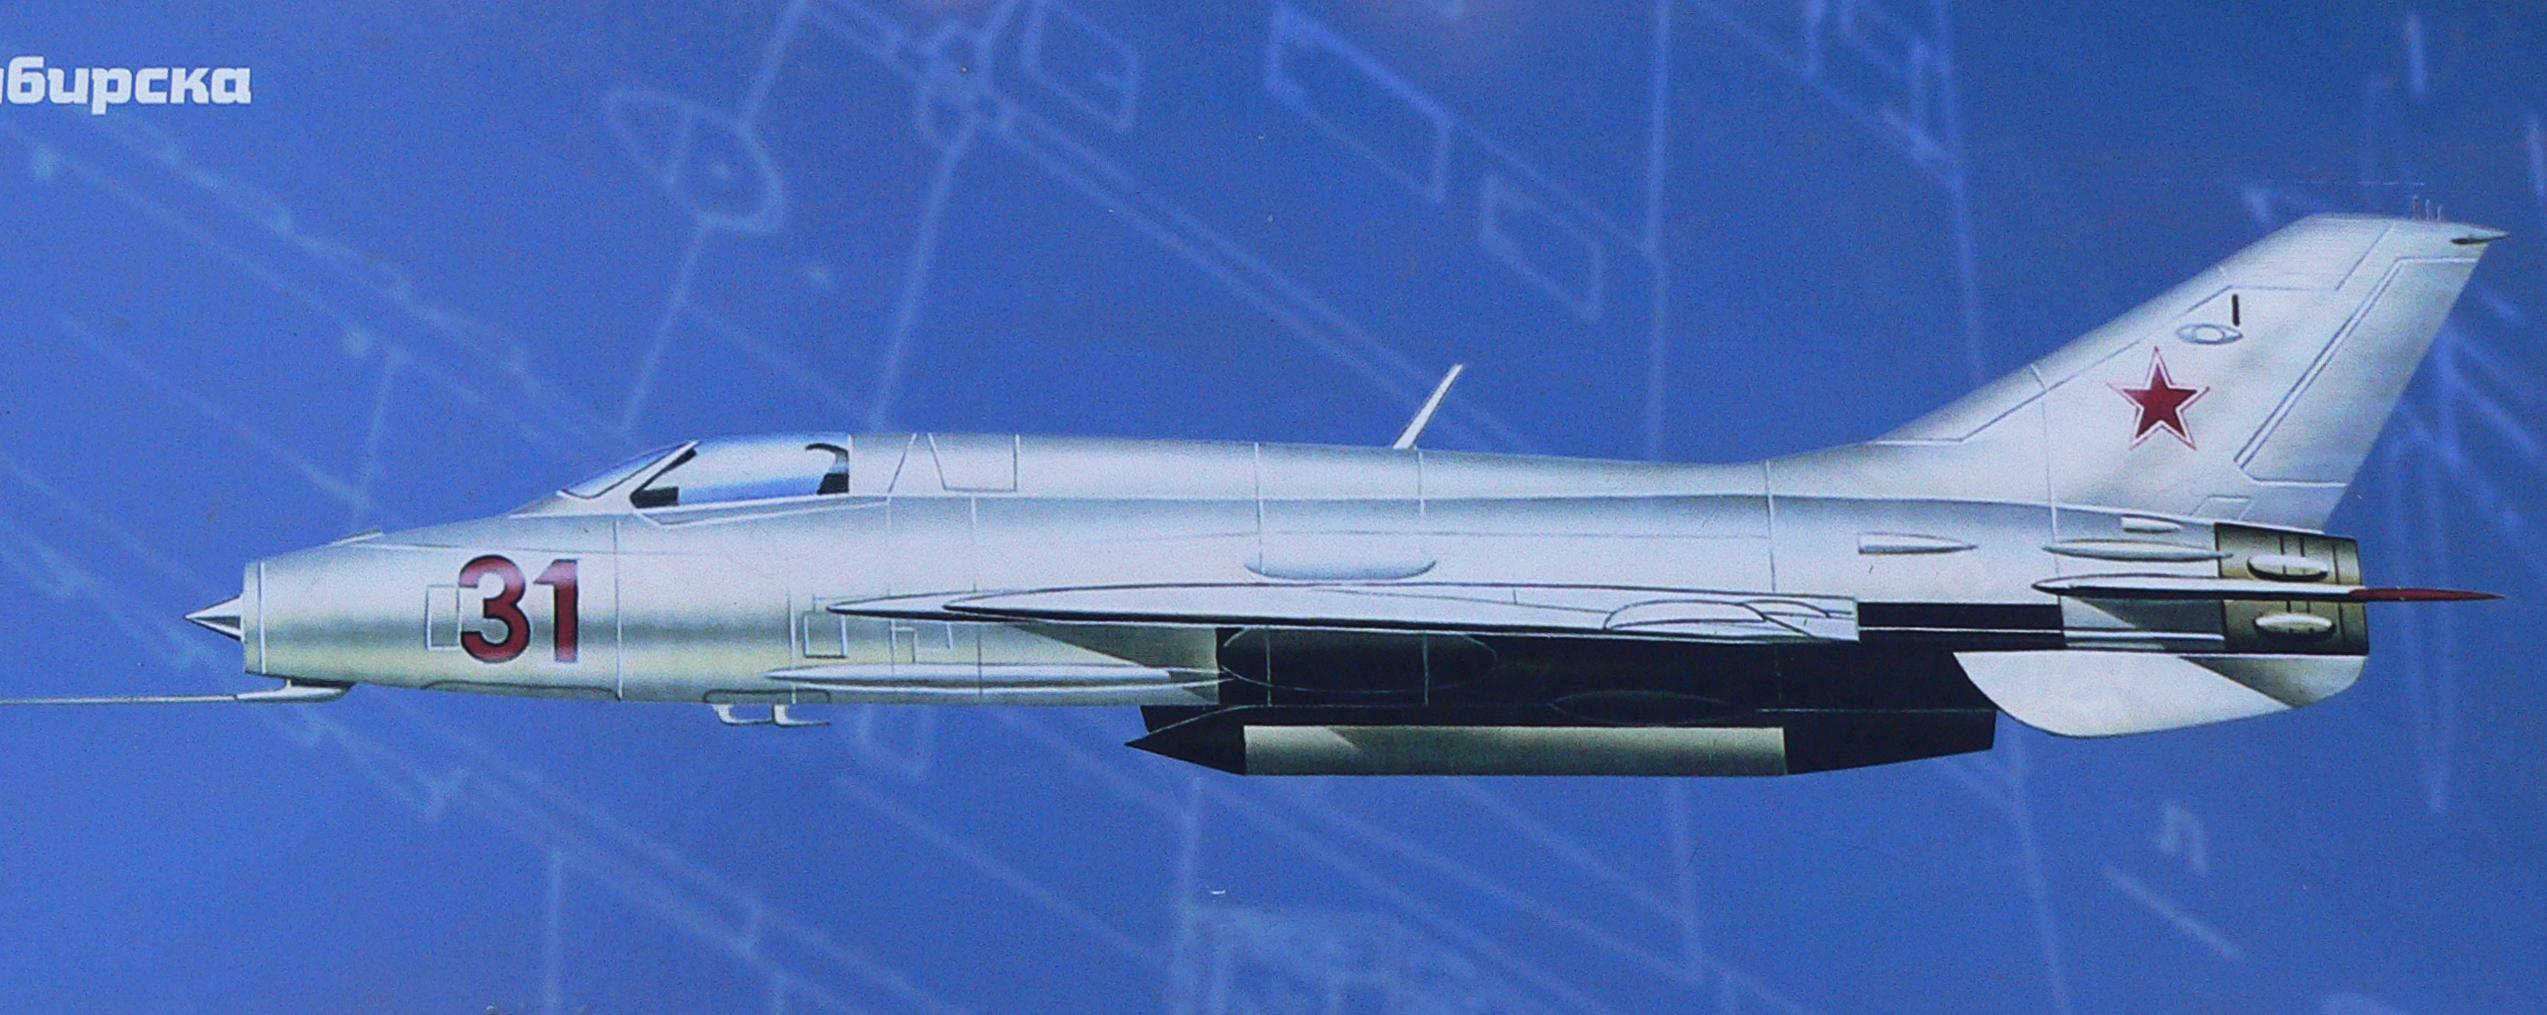 Фотография-самолета-Су17